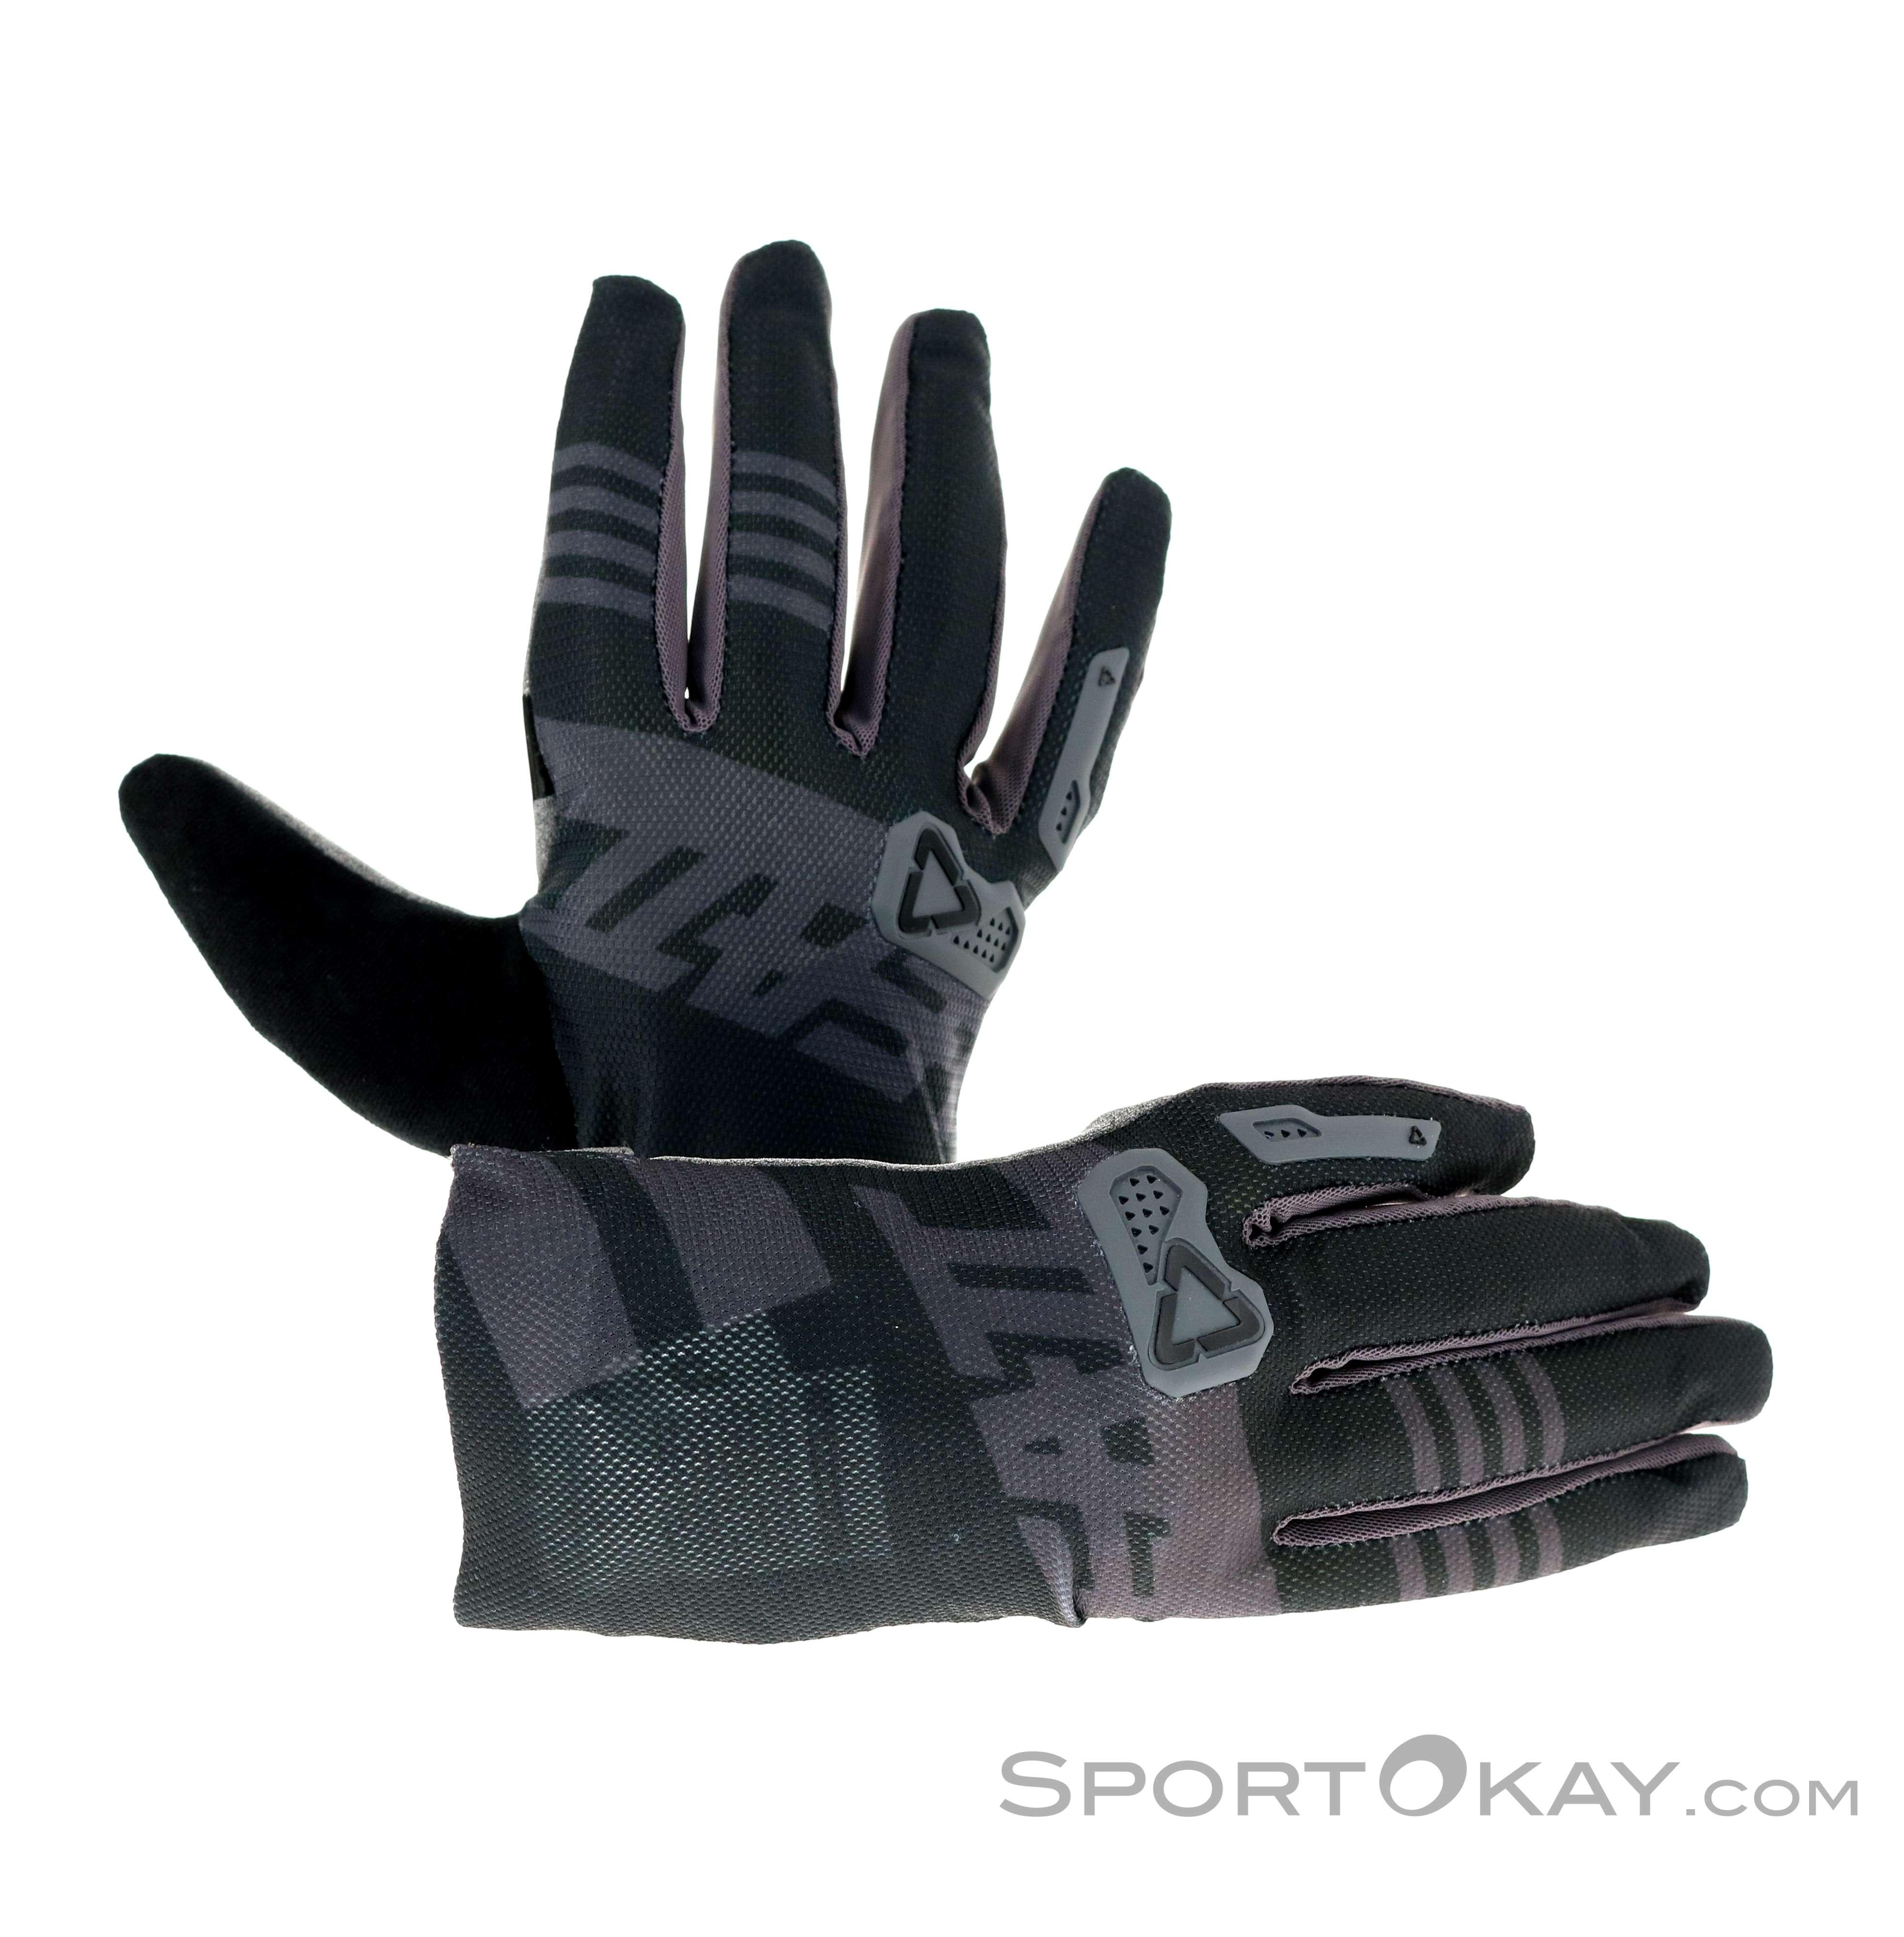 Leatt Bike-Handschuhe DBX 2.0 X-Flow Schwarz